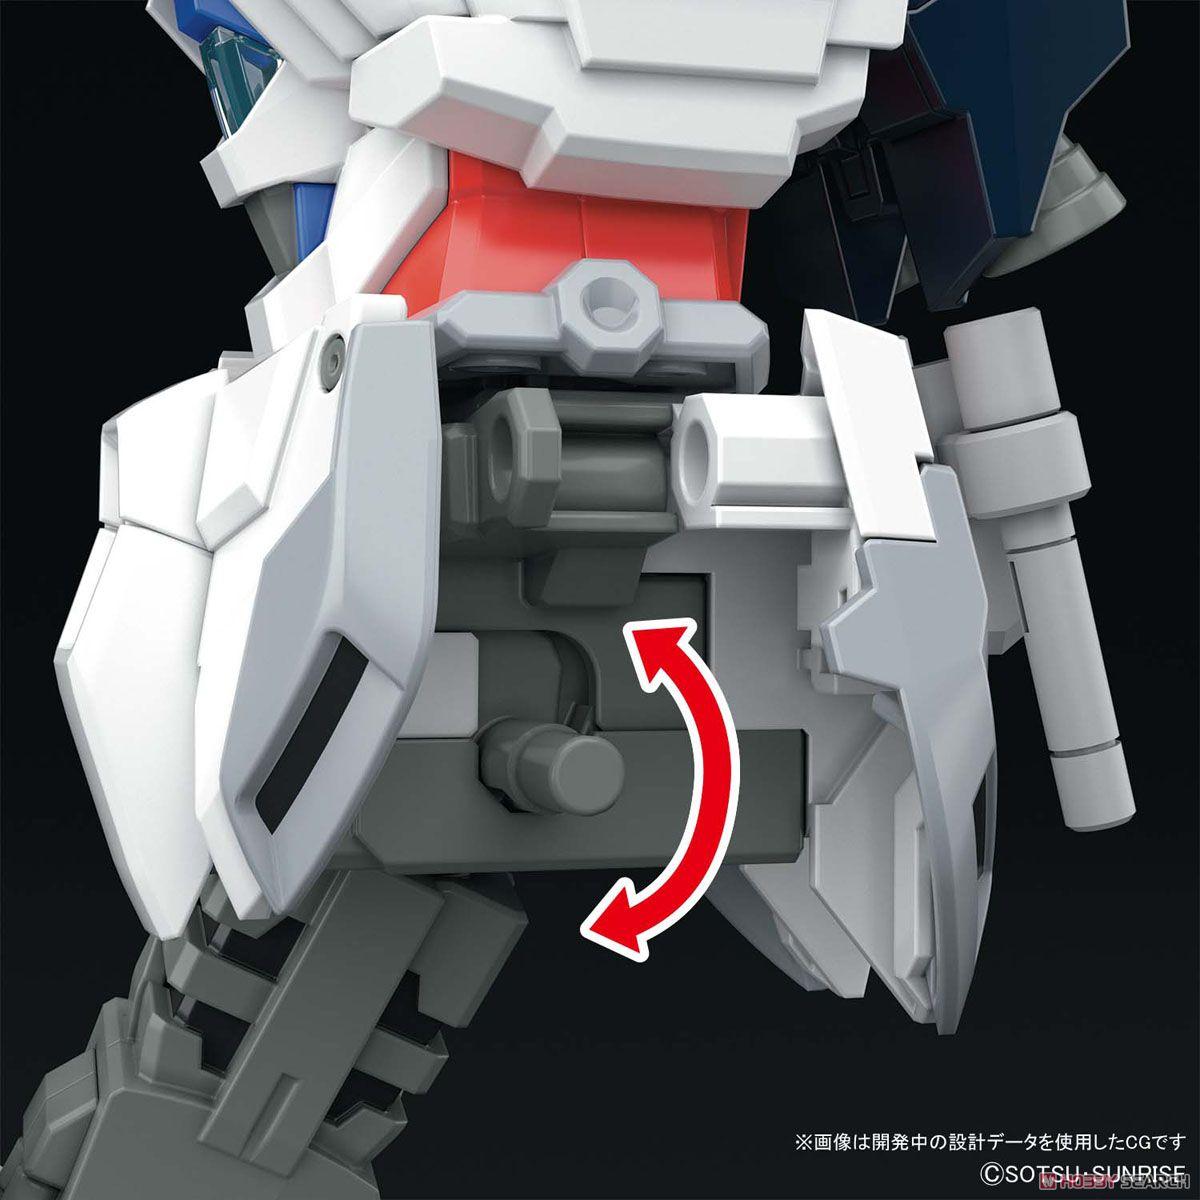 HGUC『ナラティブガンダム A装備』ガンダムNT 1/144 プラモデル-017